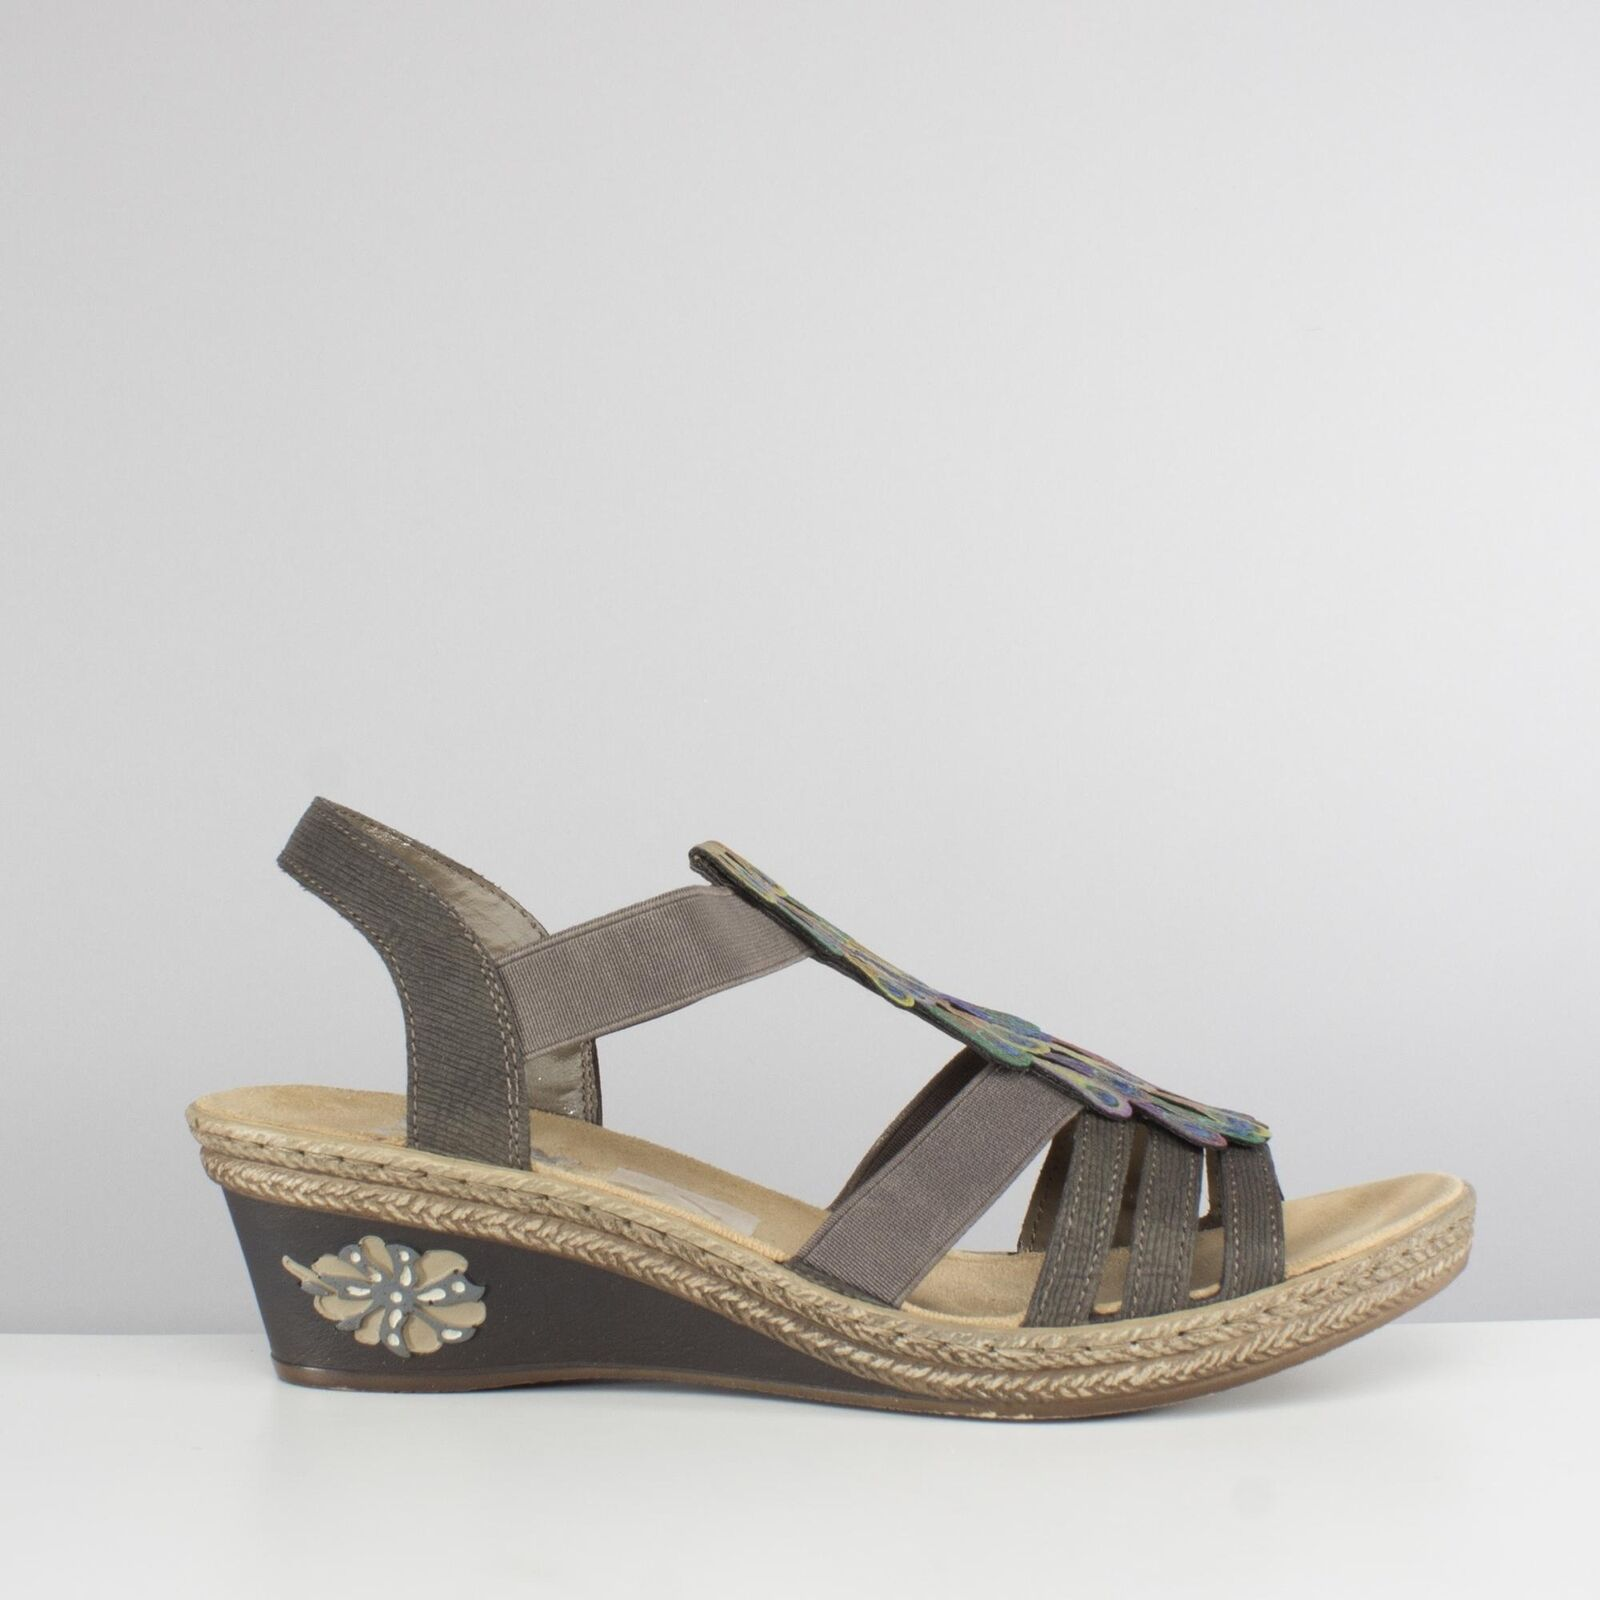 Rieker V2426-45 Ladies Womens Summer Beach Wedge Heel Open Toe Sandals Grey